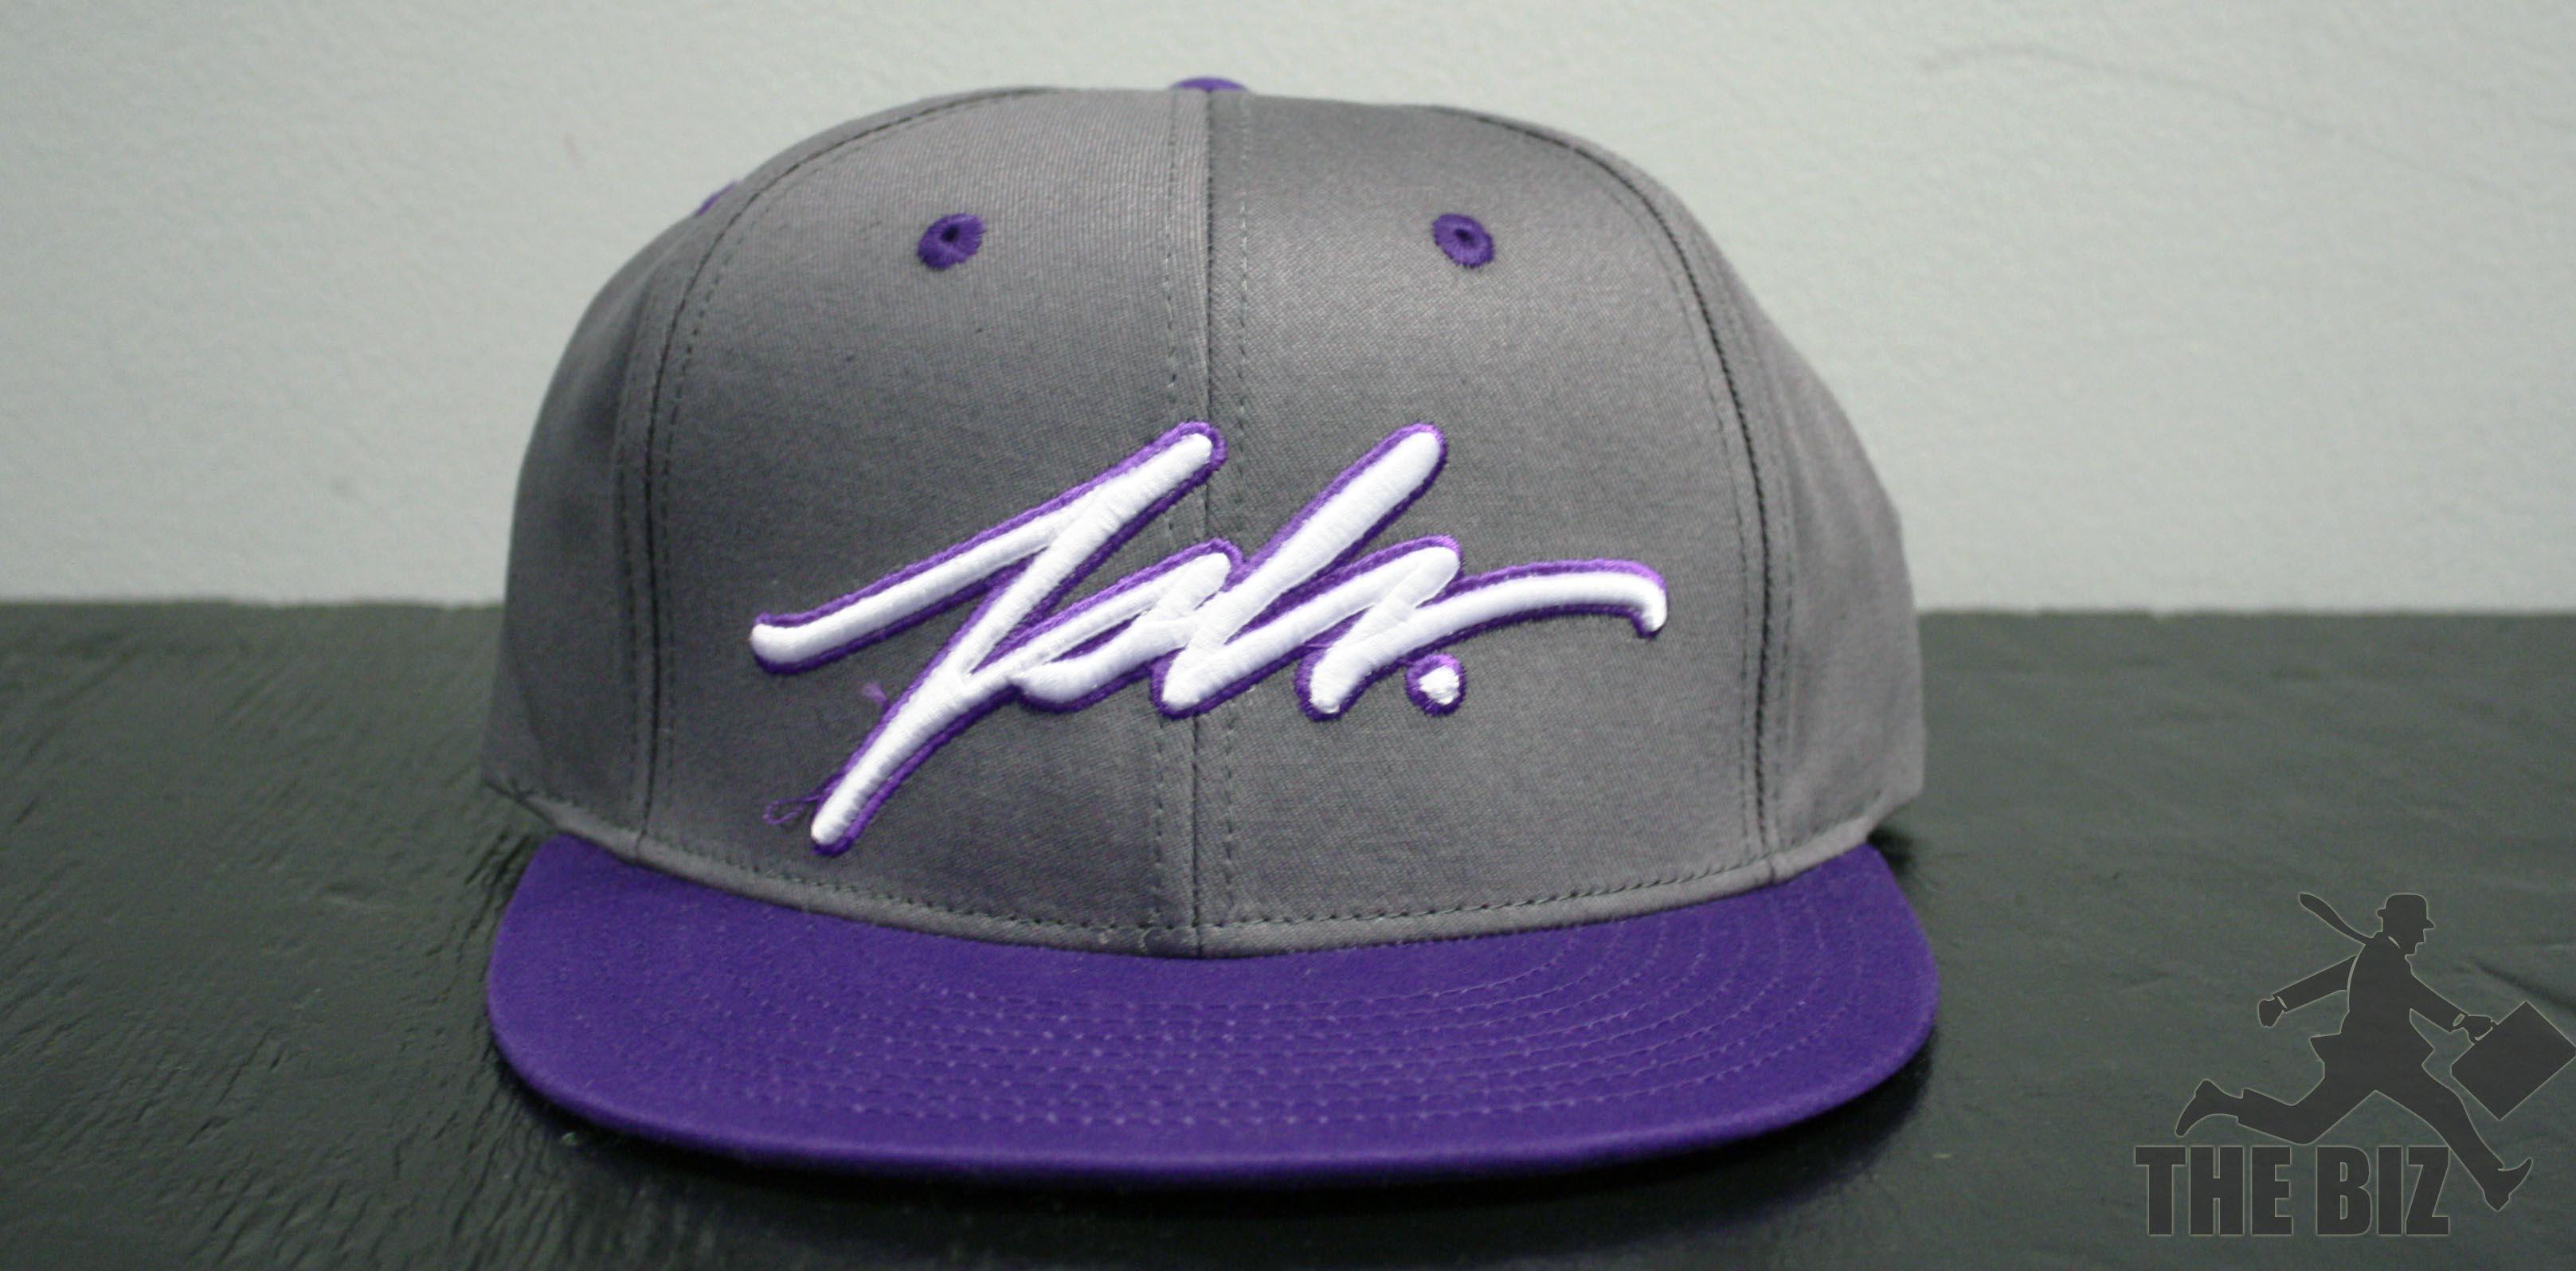 4798183f0dc The Biz Kids Present  JSLV Signature Snapbacks